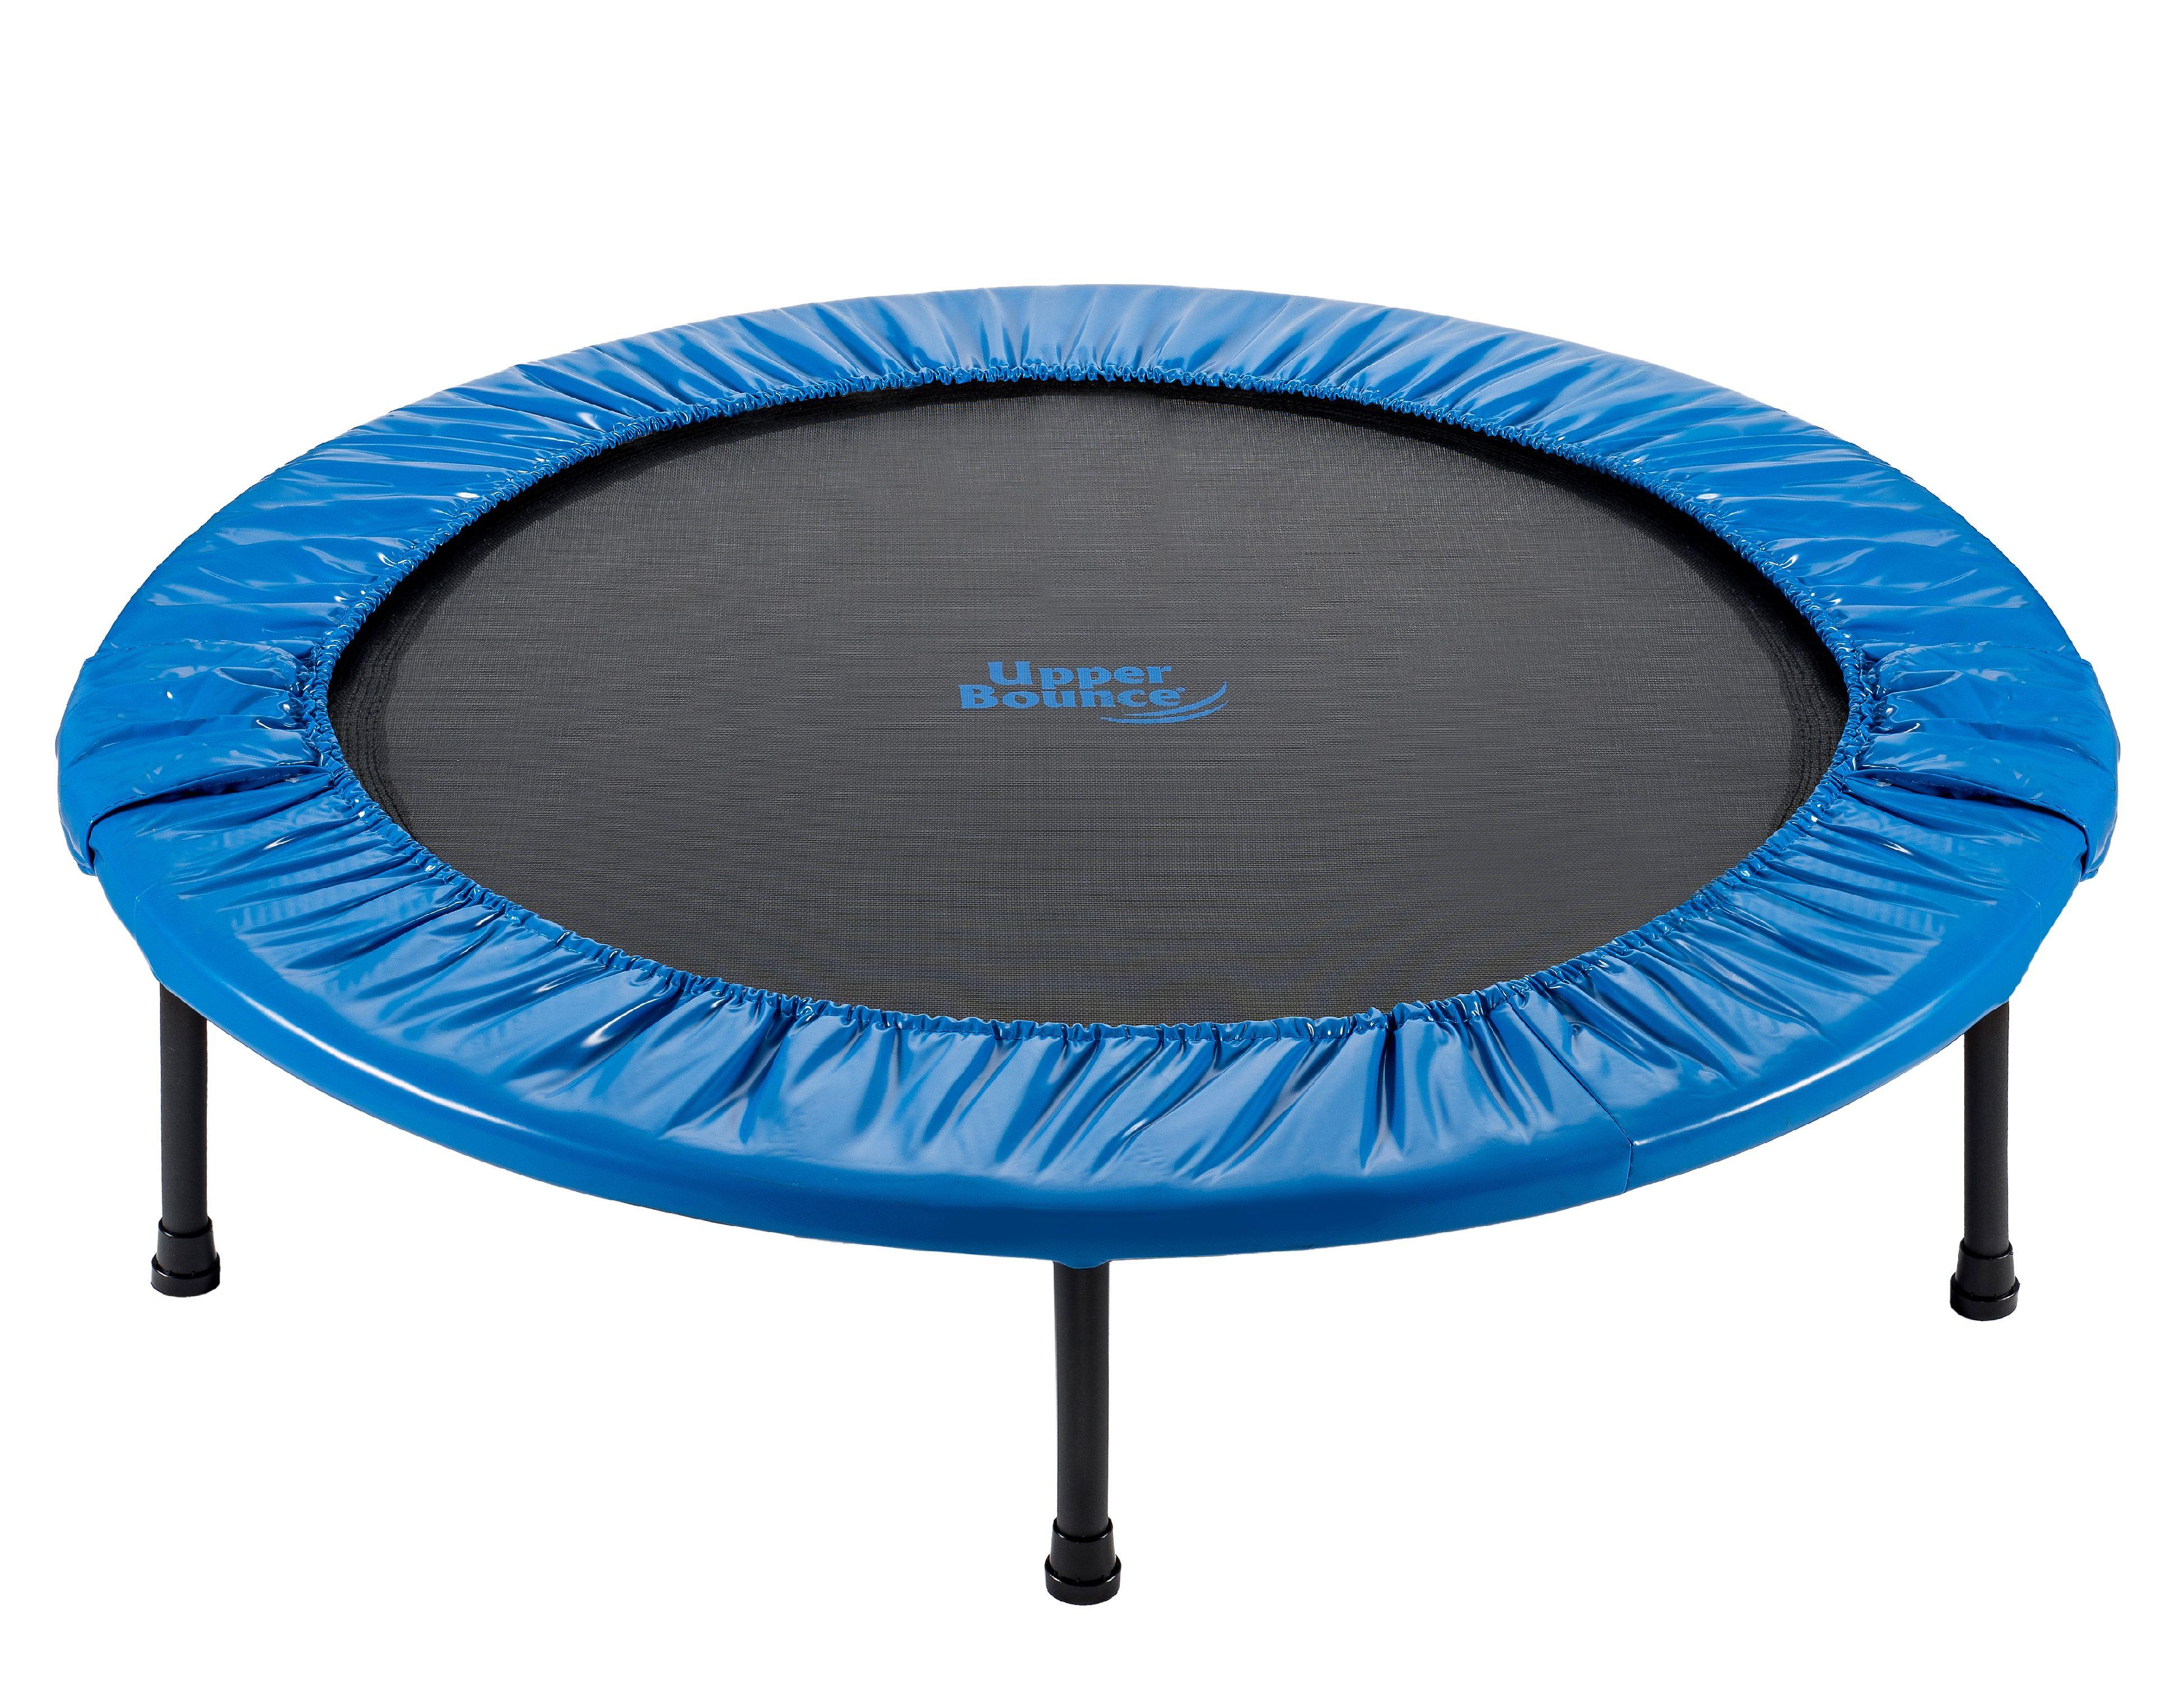 Upper Bounce 36-Inch Foldable Rebounder Trampoline, Blue by KSH Brands